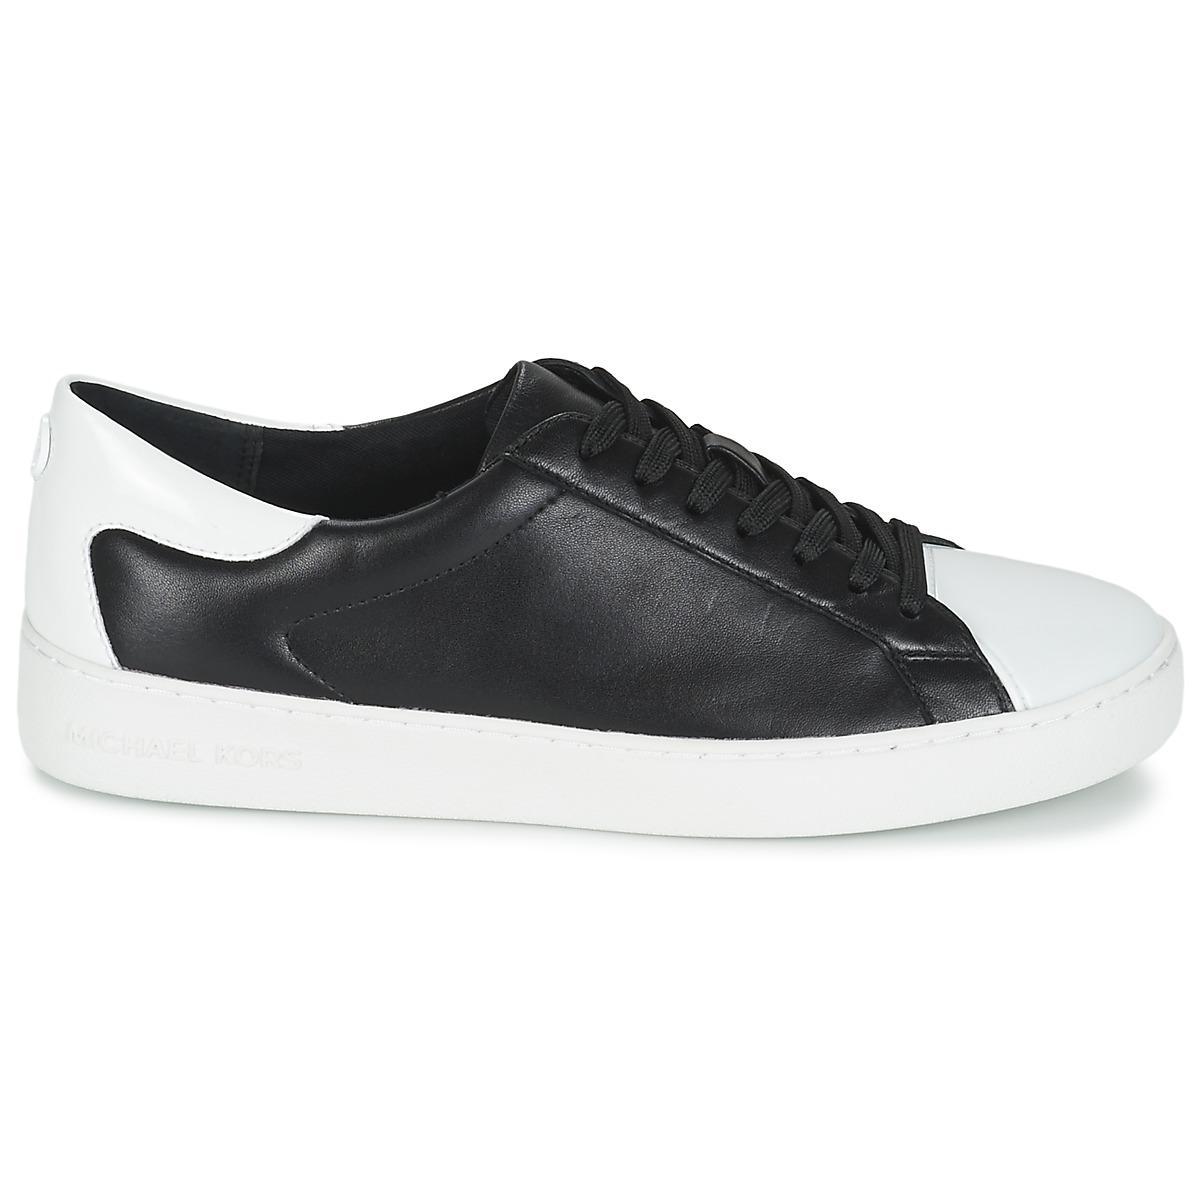 2054dfdb40c37 MICHAEL Michael Kors - Frankie Sneaker Women's Shoes (trainers) In Black -  Lyst. View fullscreen